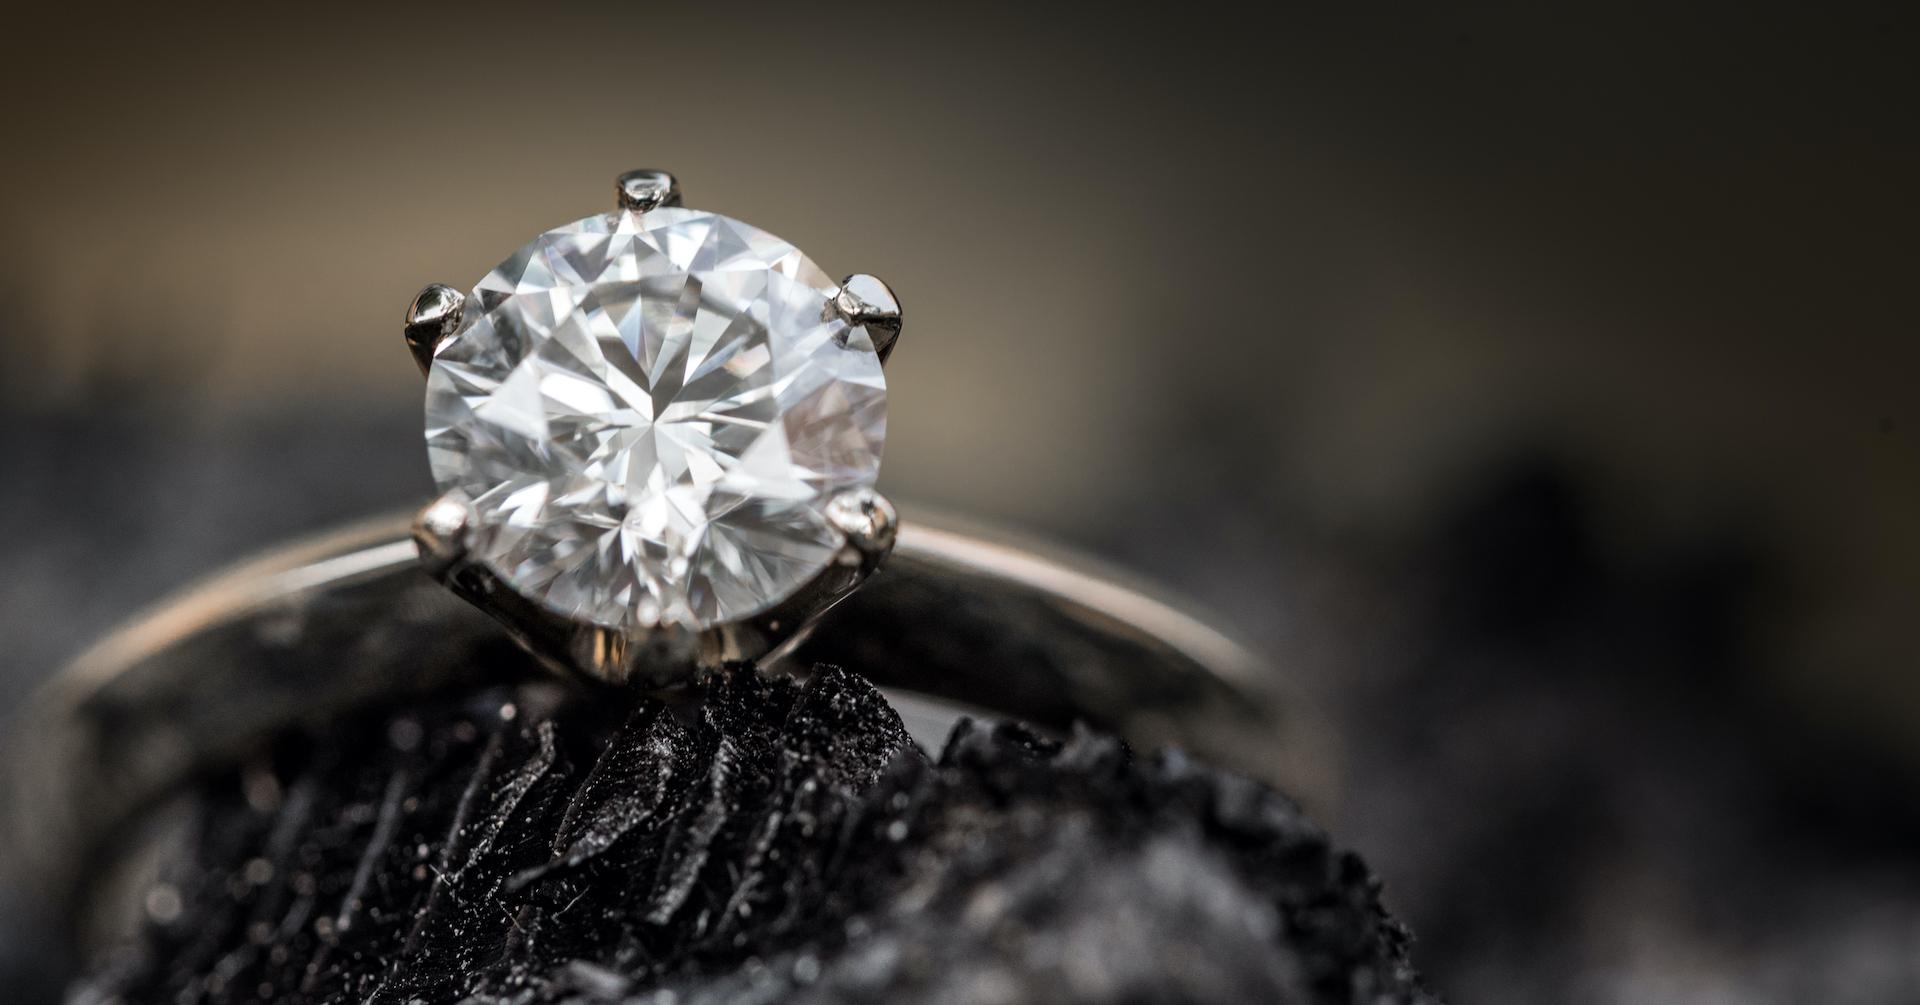 A Brief History of Diamond Jewellery